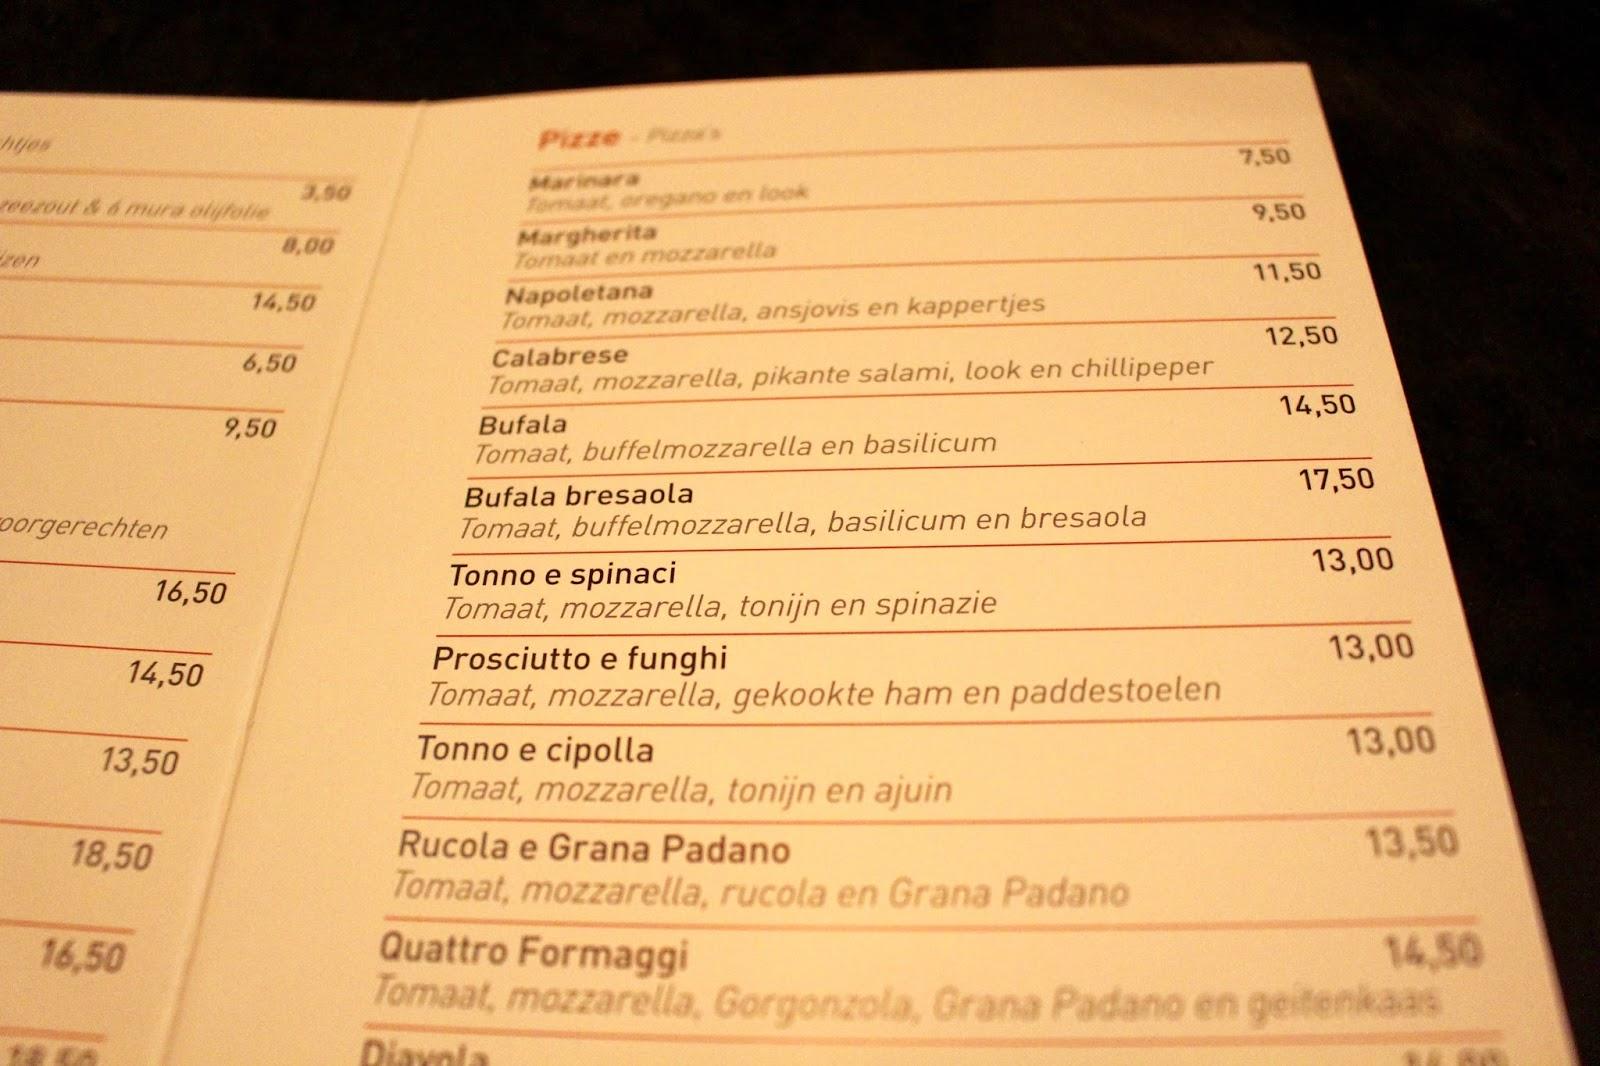 Pizza in Antwerp - Civilta Del Bere